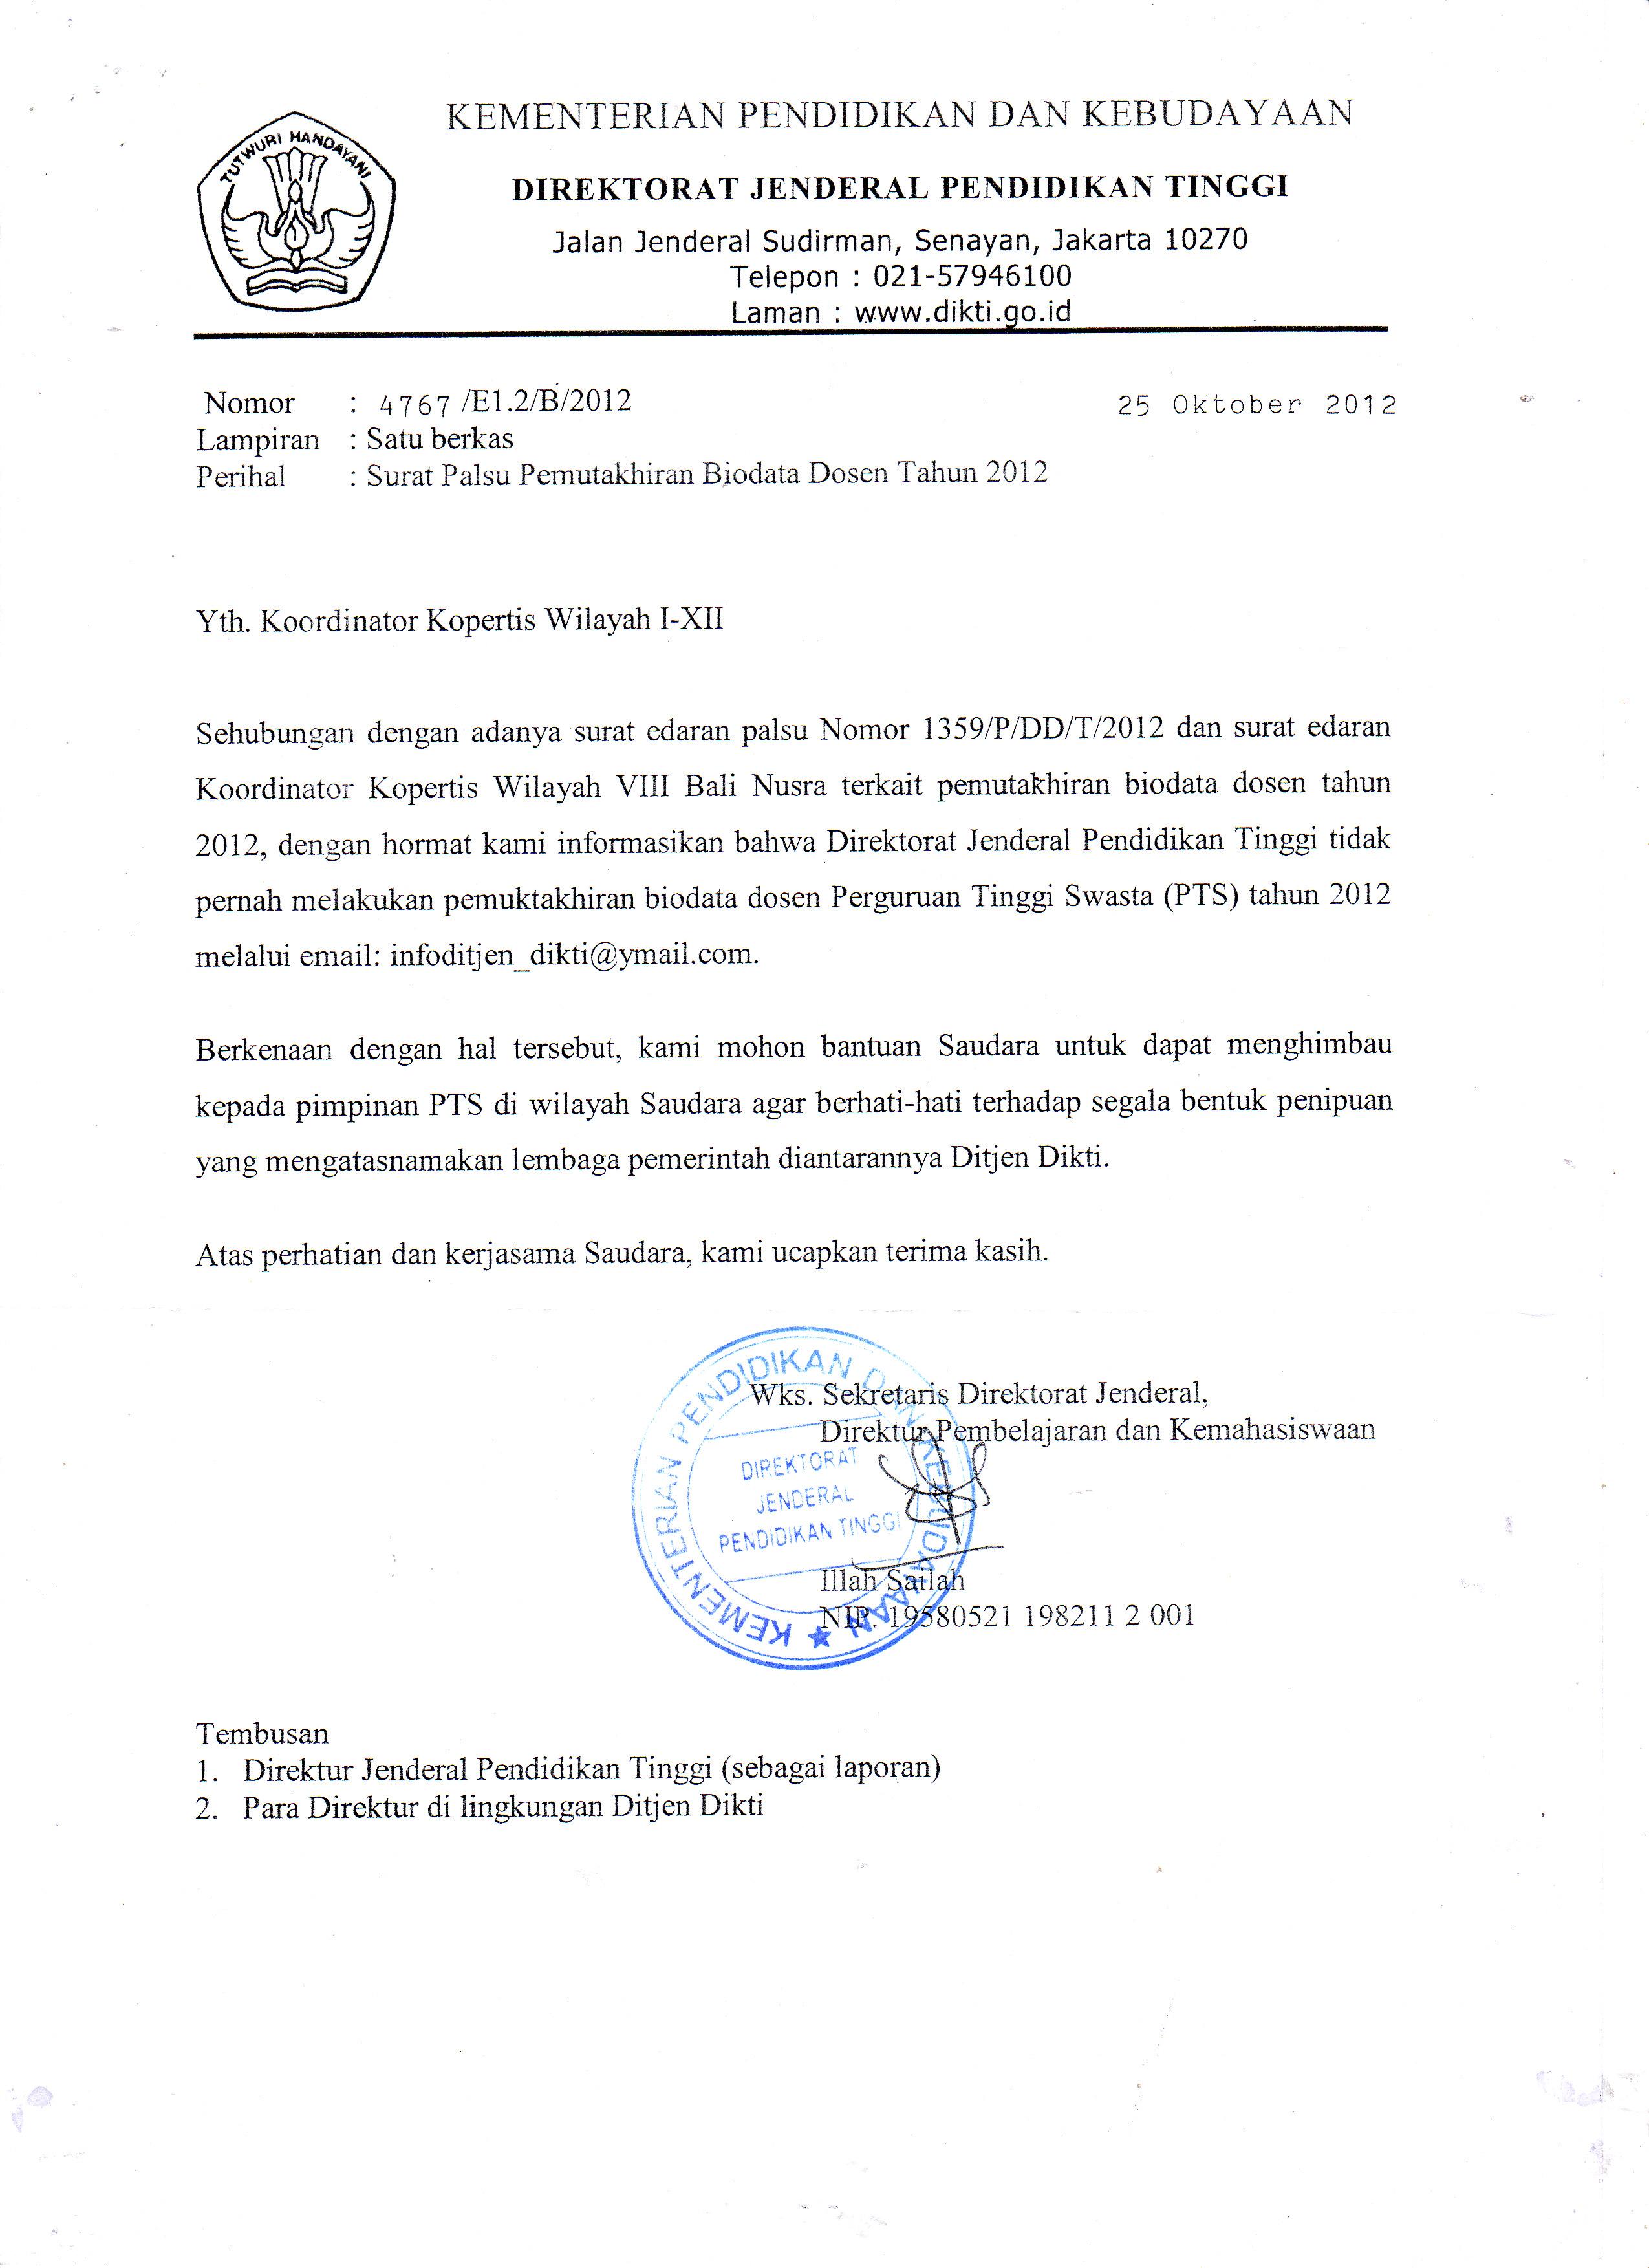 Waspadai Surat Palsu Pemutakhiran Biodata Dosen Tahun 2012